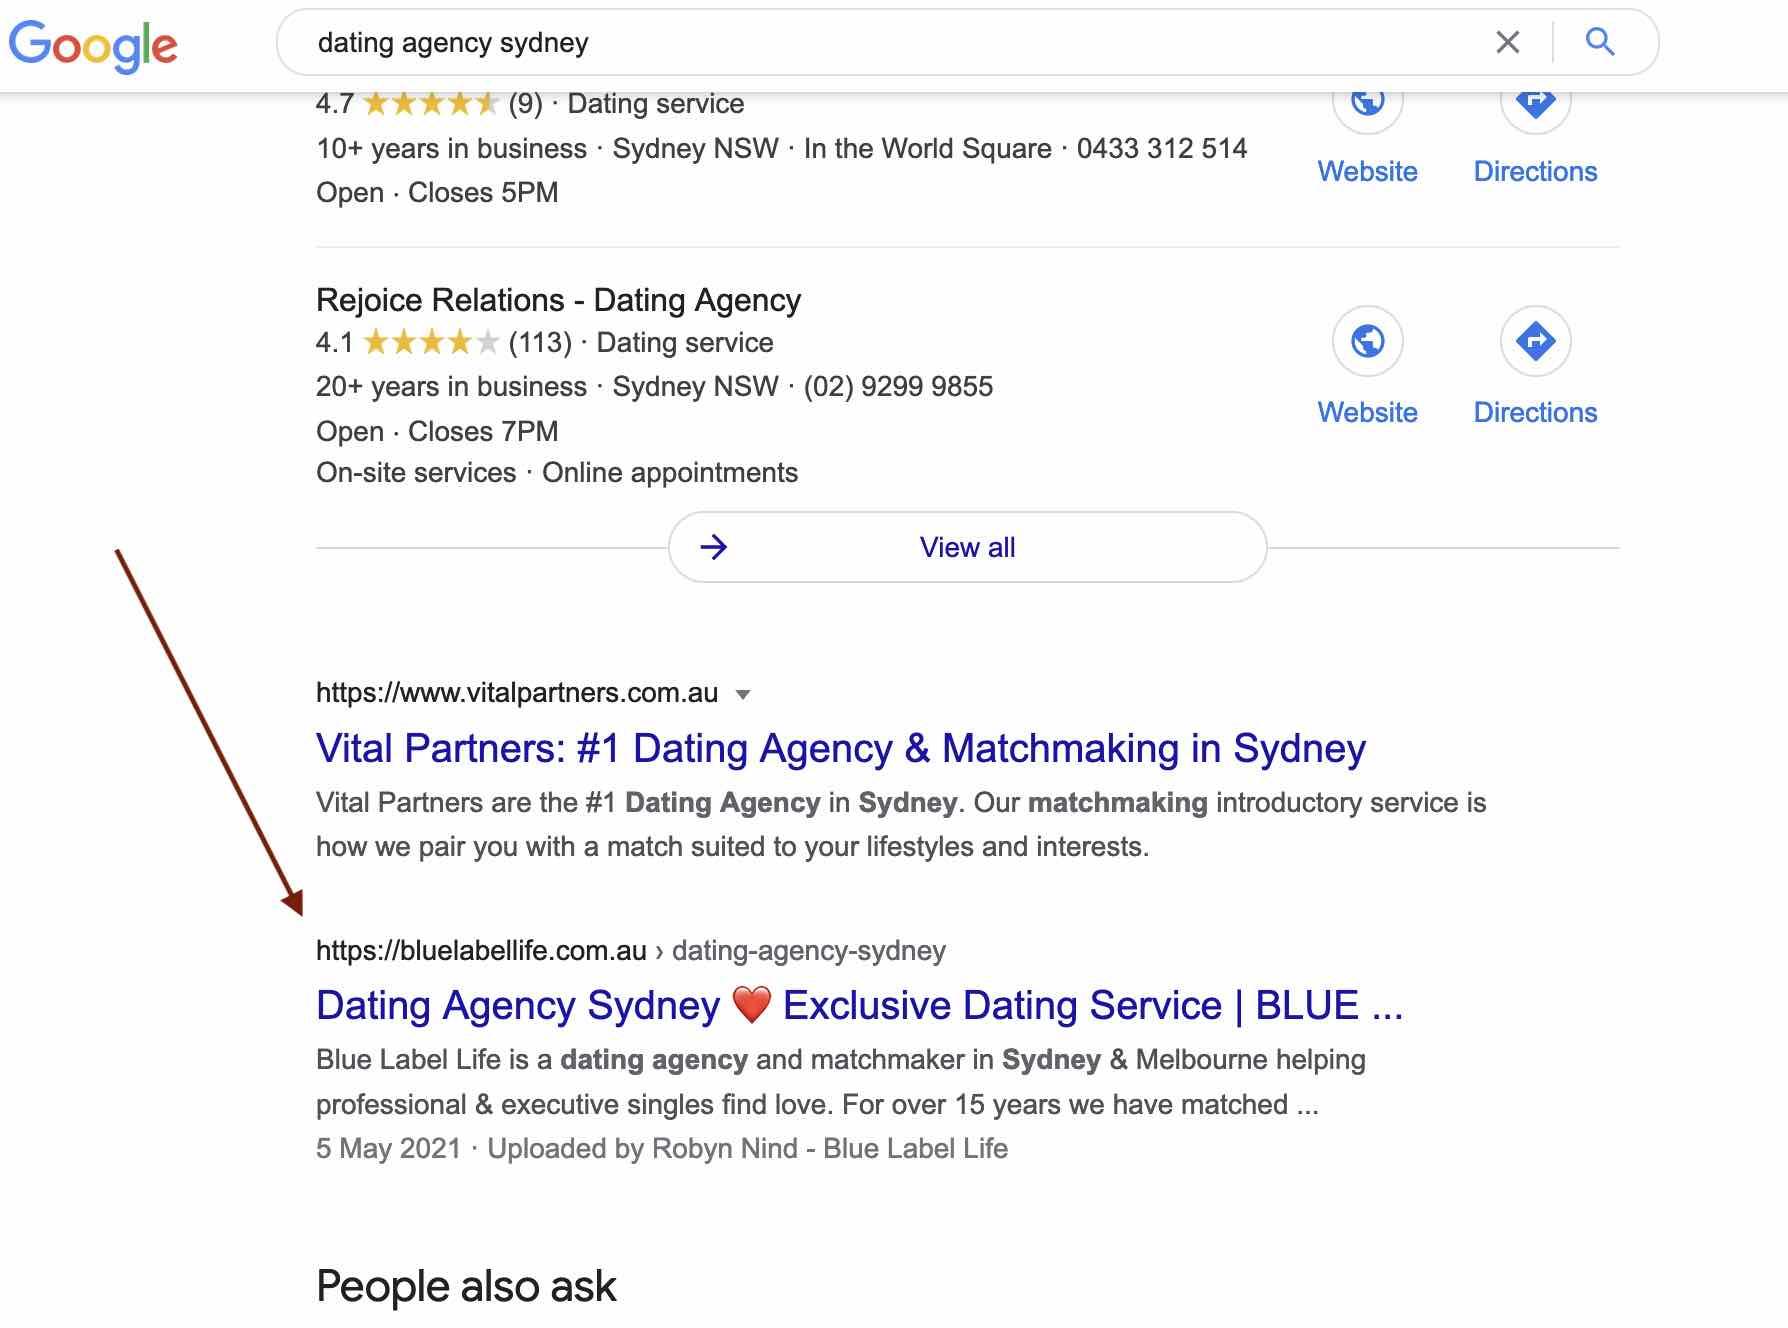 blue label life google rankings